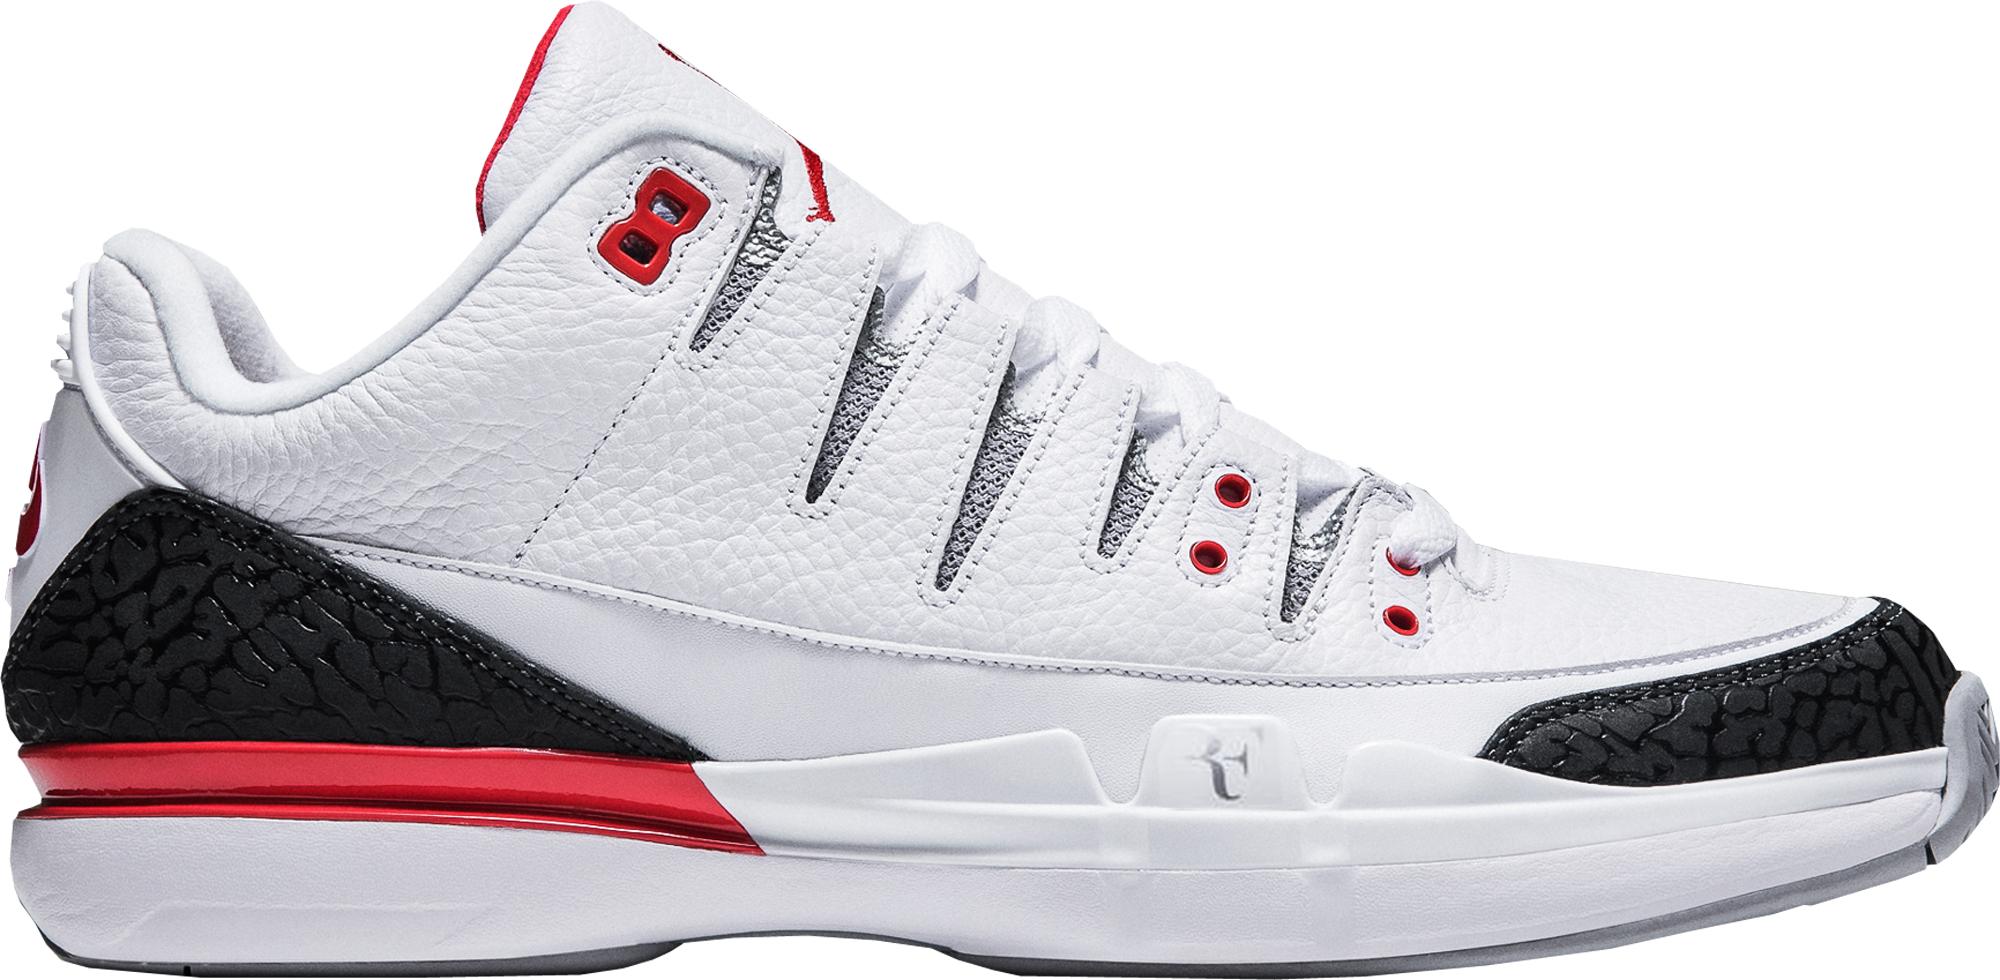 Nike Zoom Vapor AJ3 Fire Red